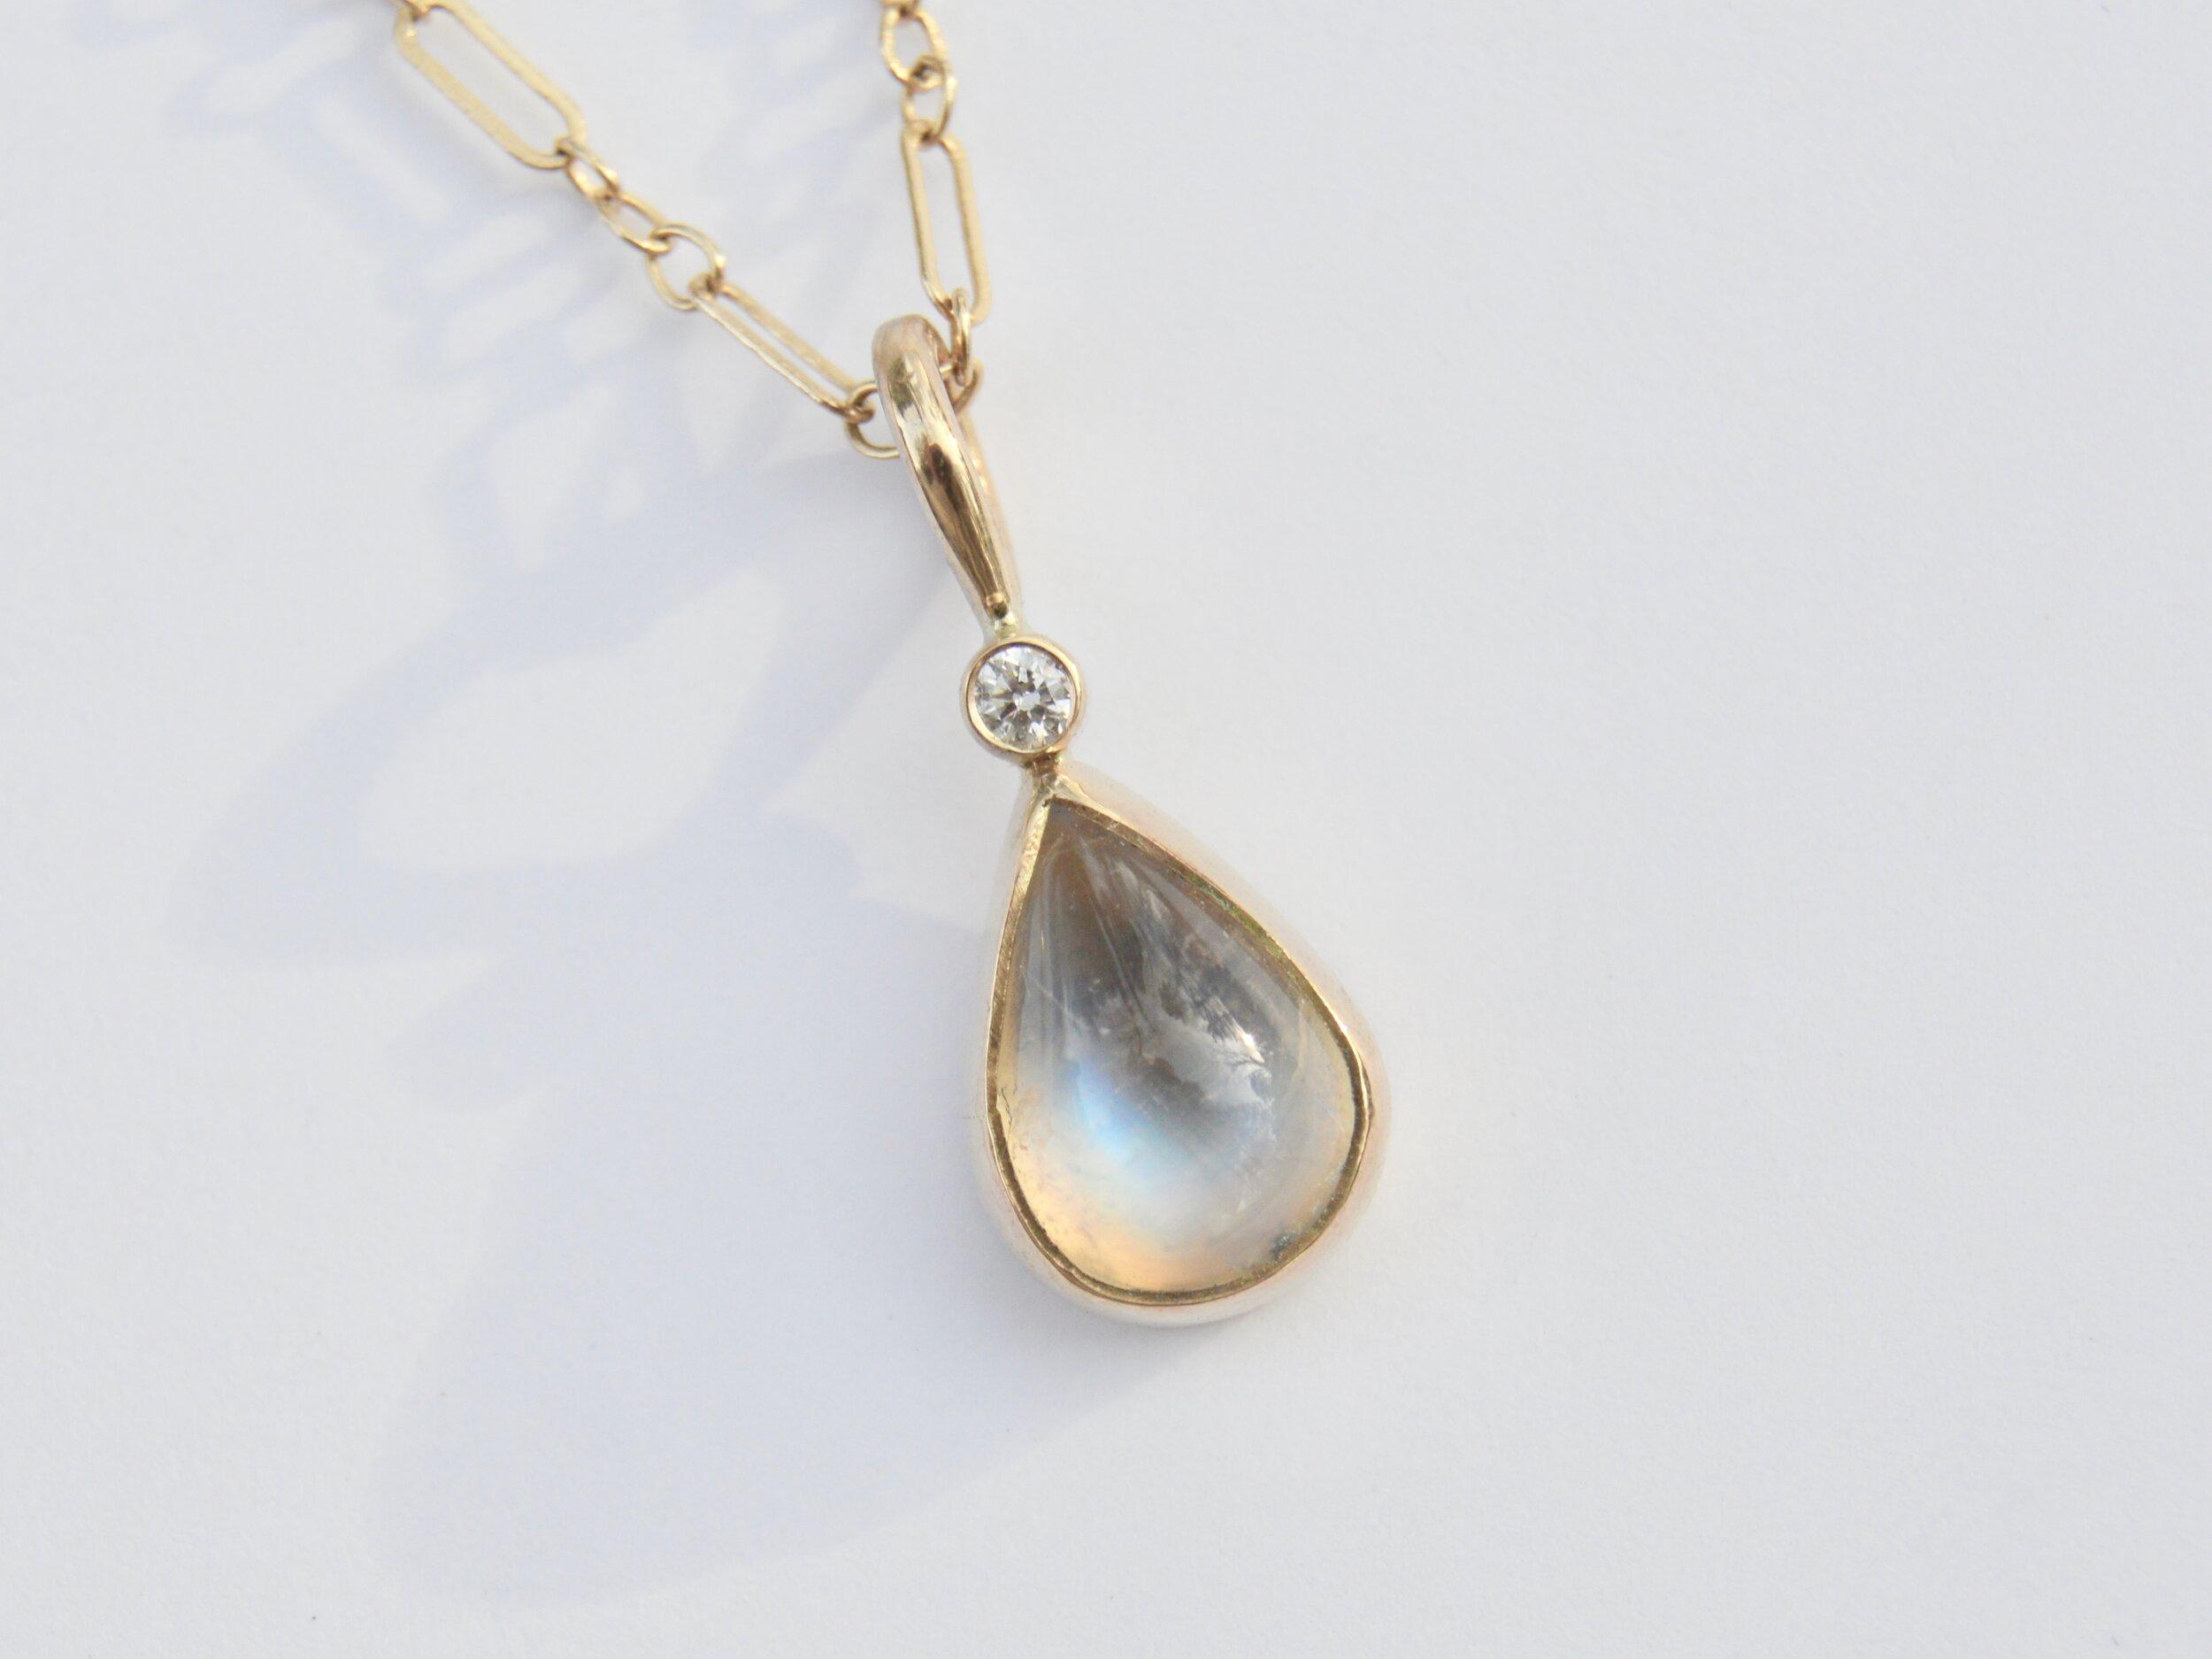 Whiteblue stardust necklace.